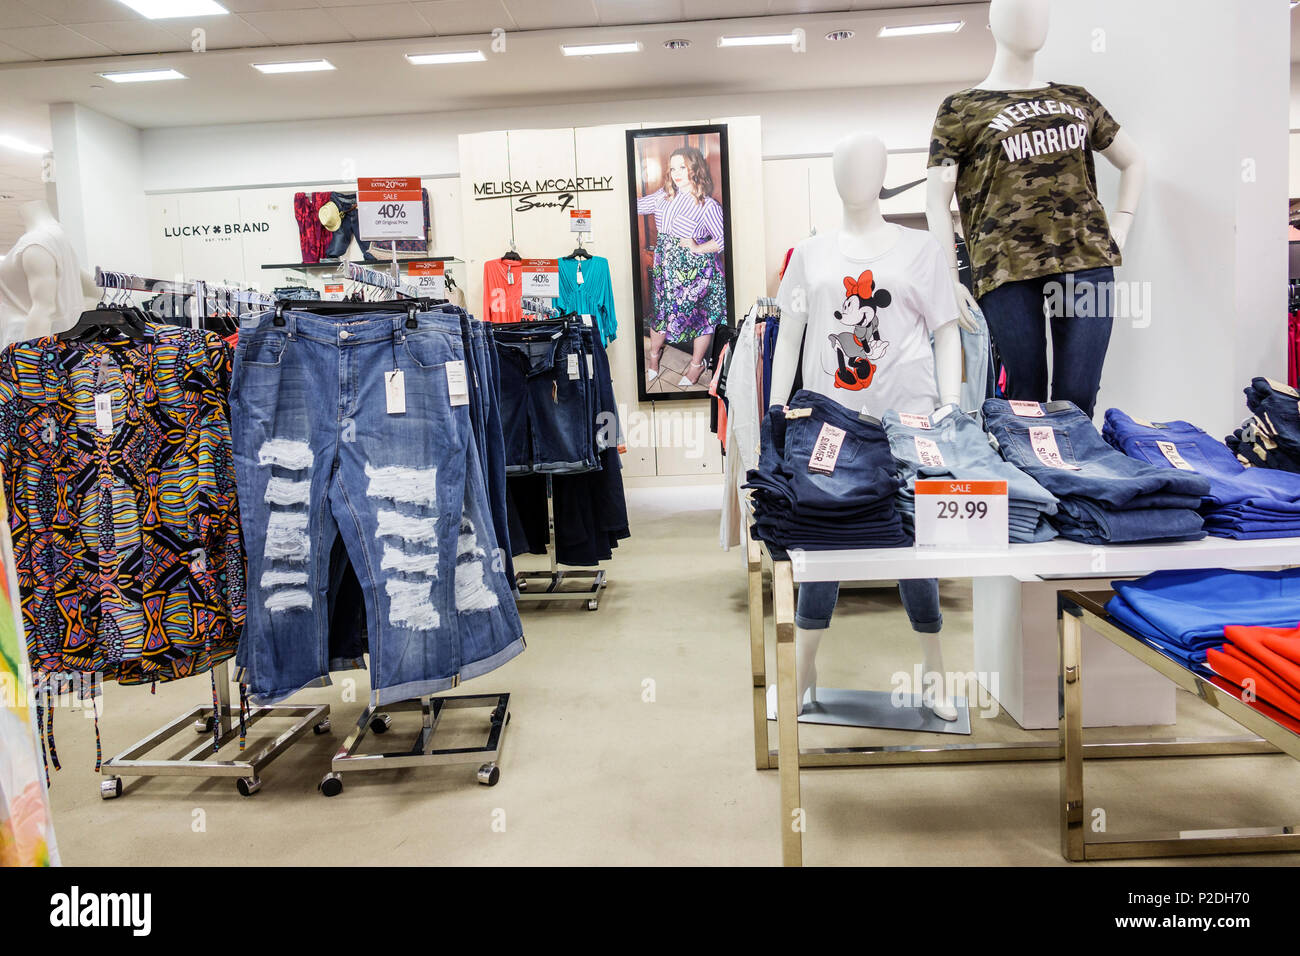 Florida Jensen Beach Macy Kaufhaus innen shopping Frauen plus die Größe- kleidung Casual Wear Lucky e1baddbf1b